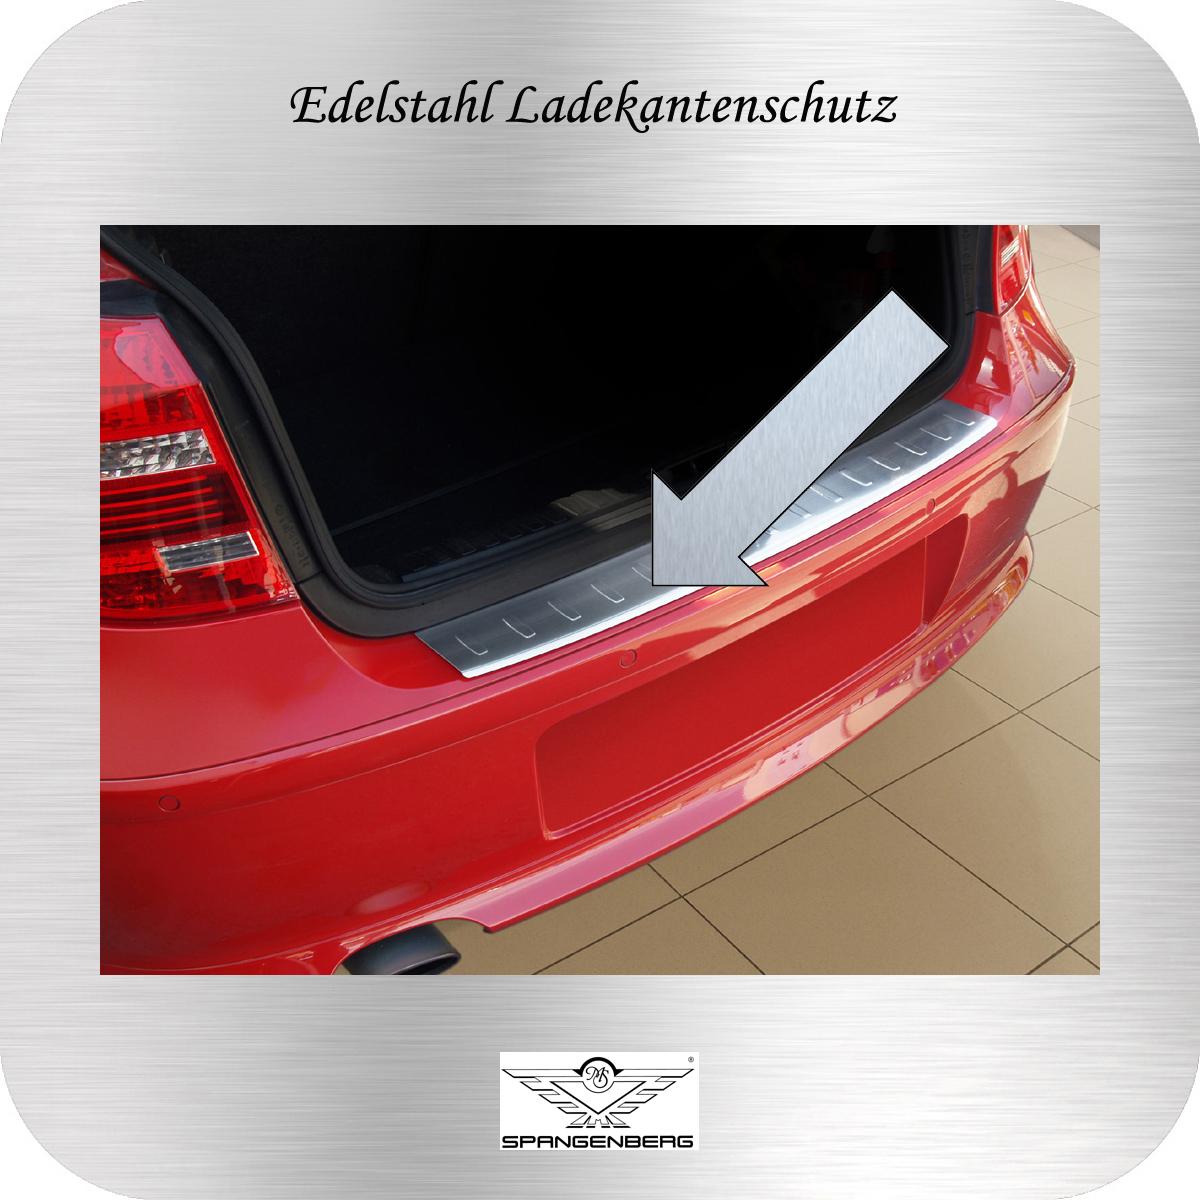 Ladekantenschutz Edelstahl BMW 1er E81 3-Türer und E87 5-Türer 2004-11 3235742